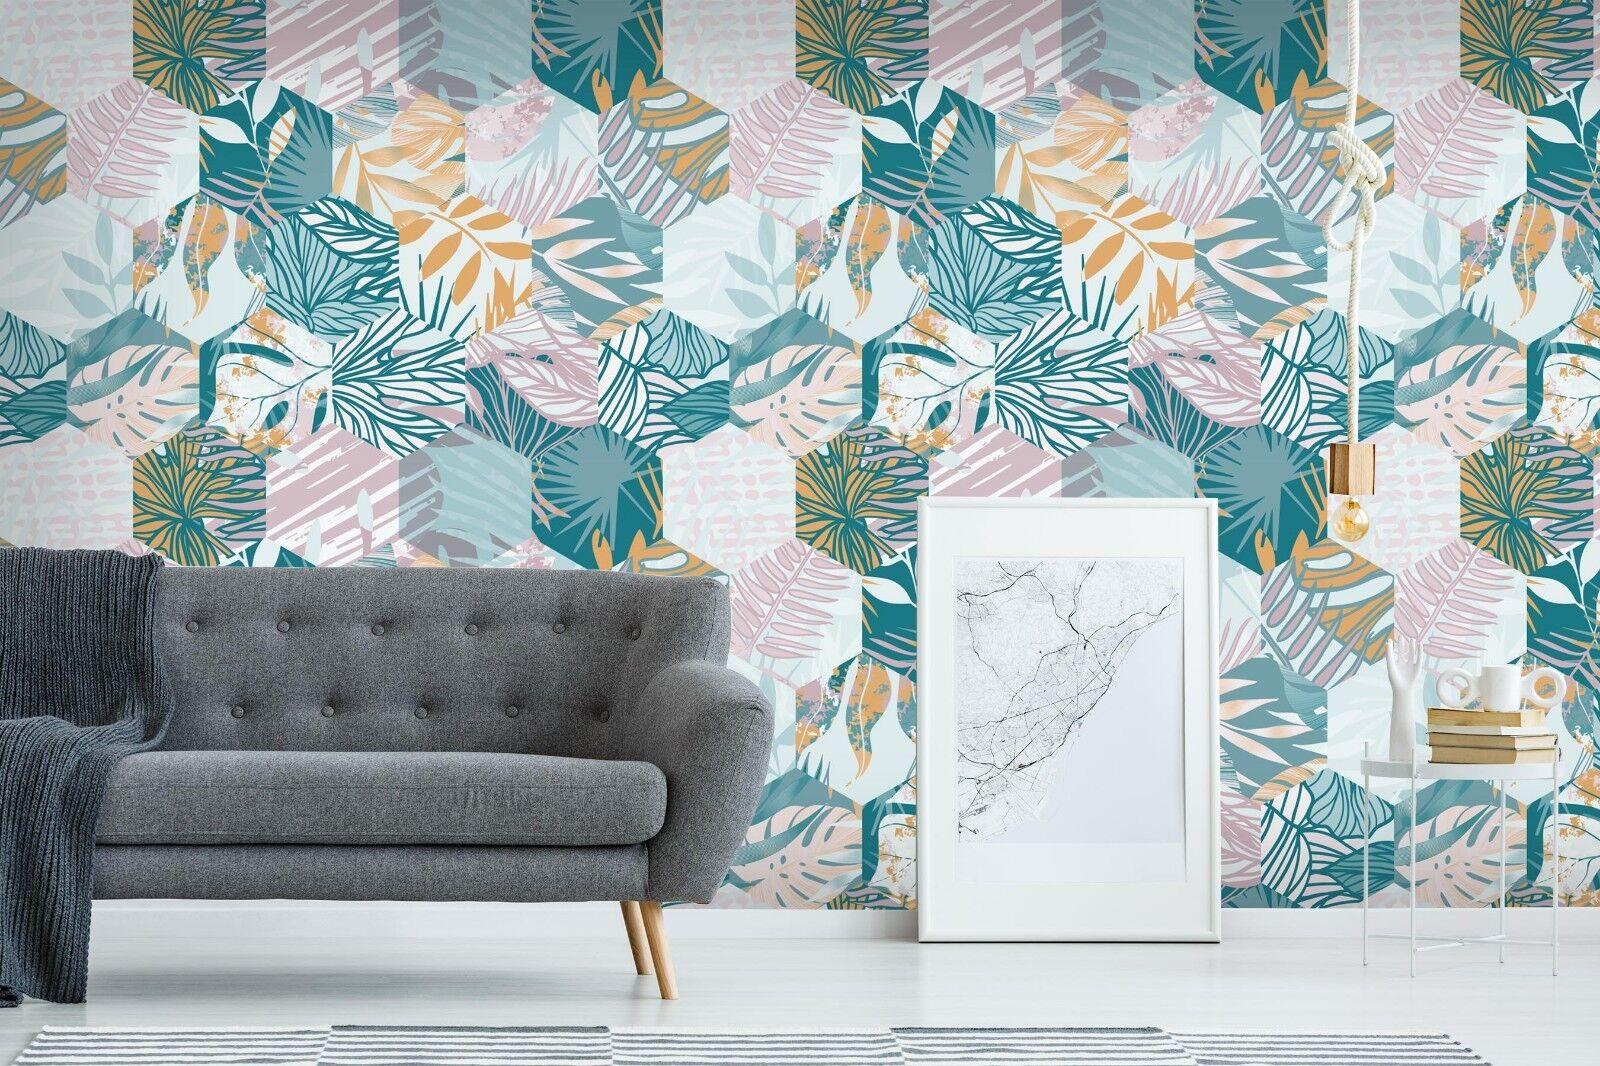 3D Grün Pattern 8 Wall Paper Print Wall Decal Deco Indoor Wall Murals US Summer